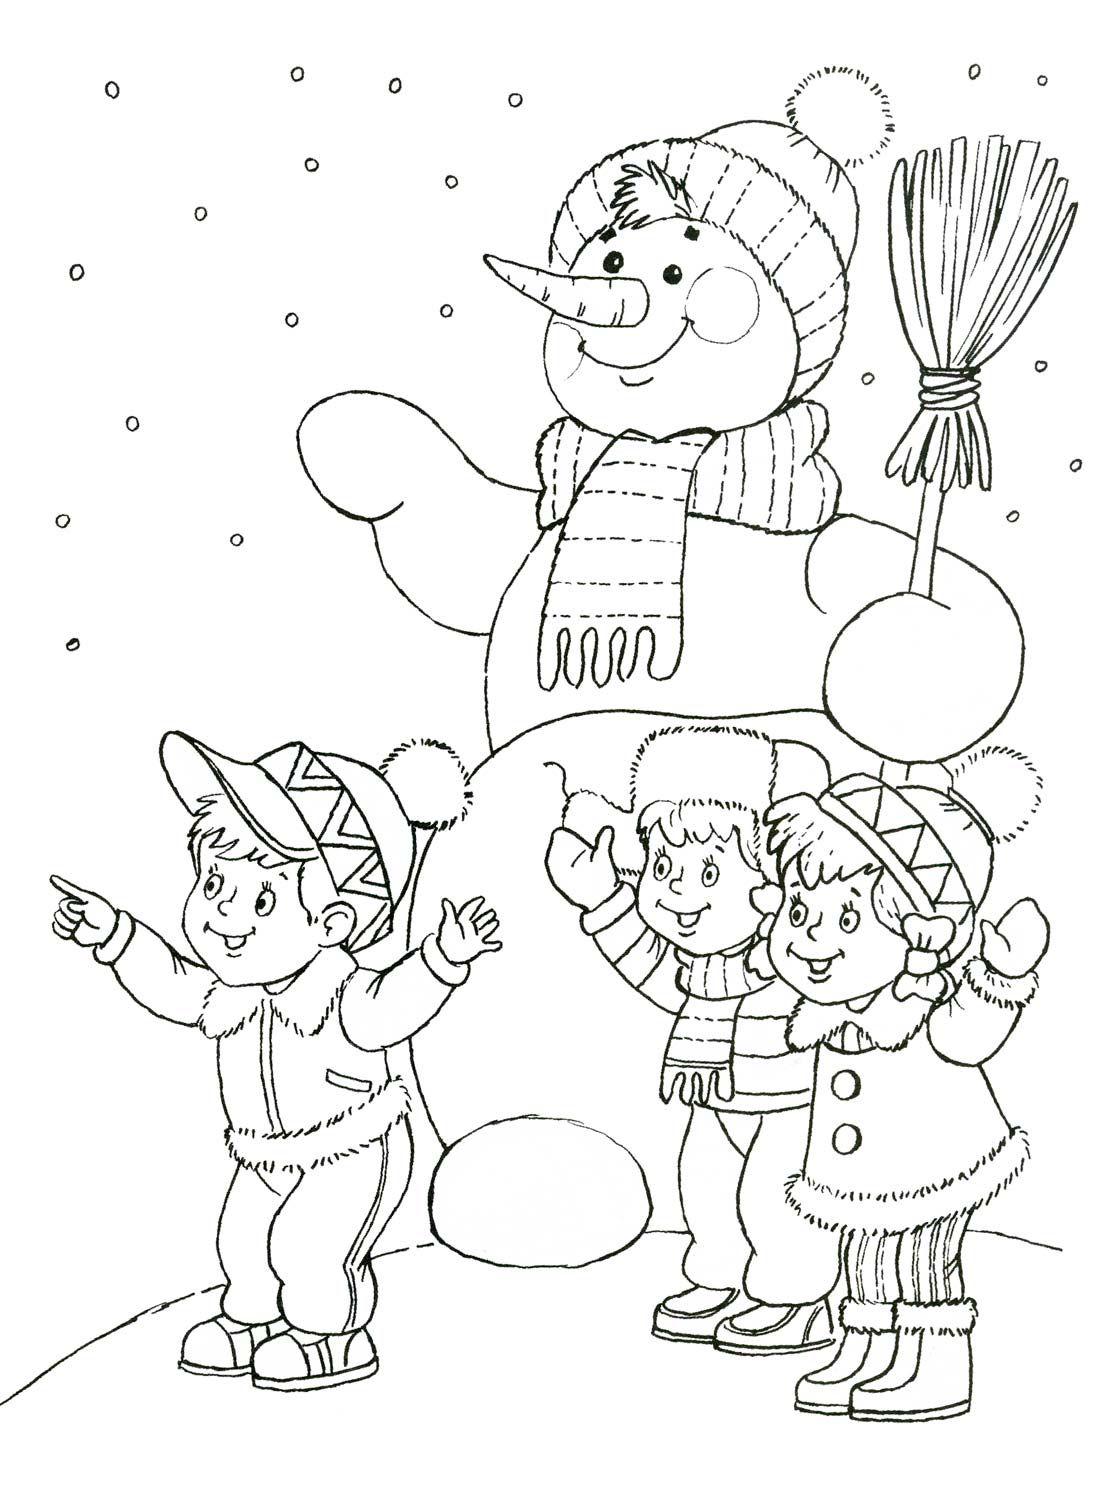 Adult Coloring Pages Books Kids Colouring Color Sheets Christmas Colors Winter Craft Talvi Saint Nicolas